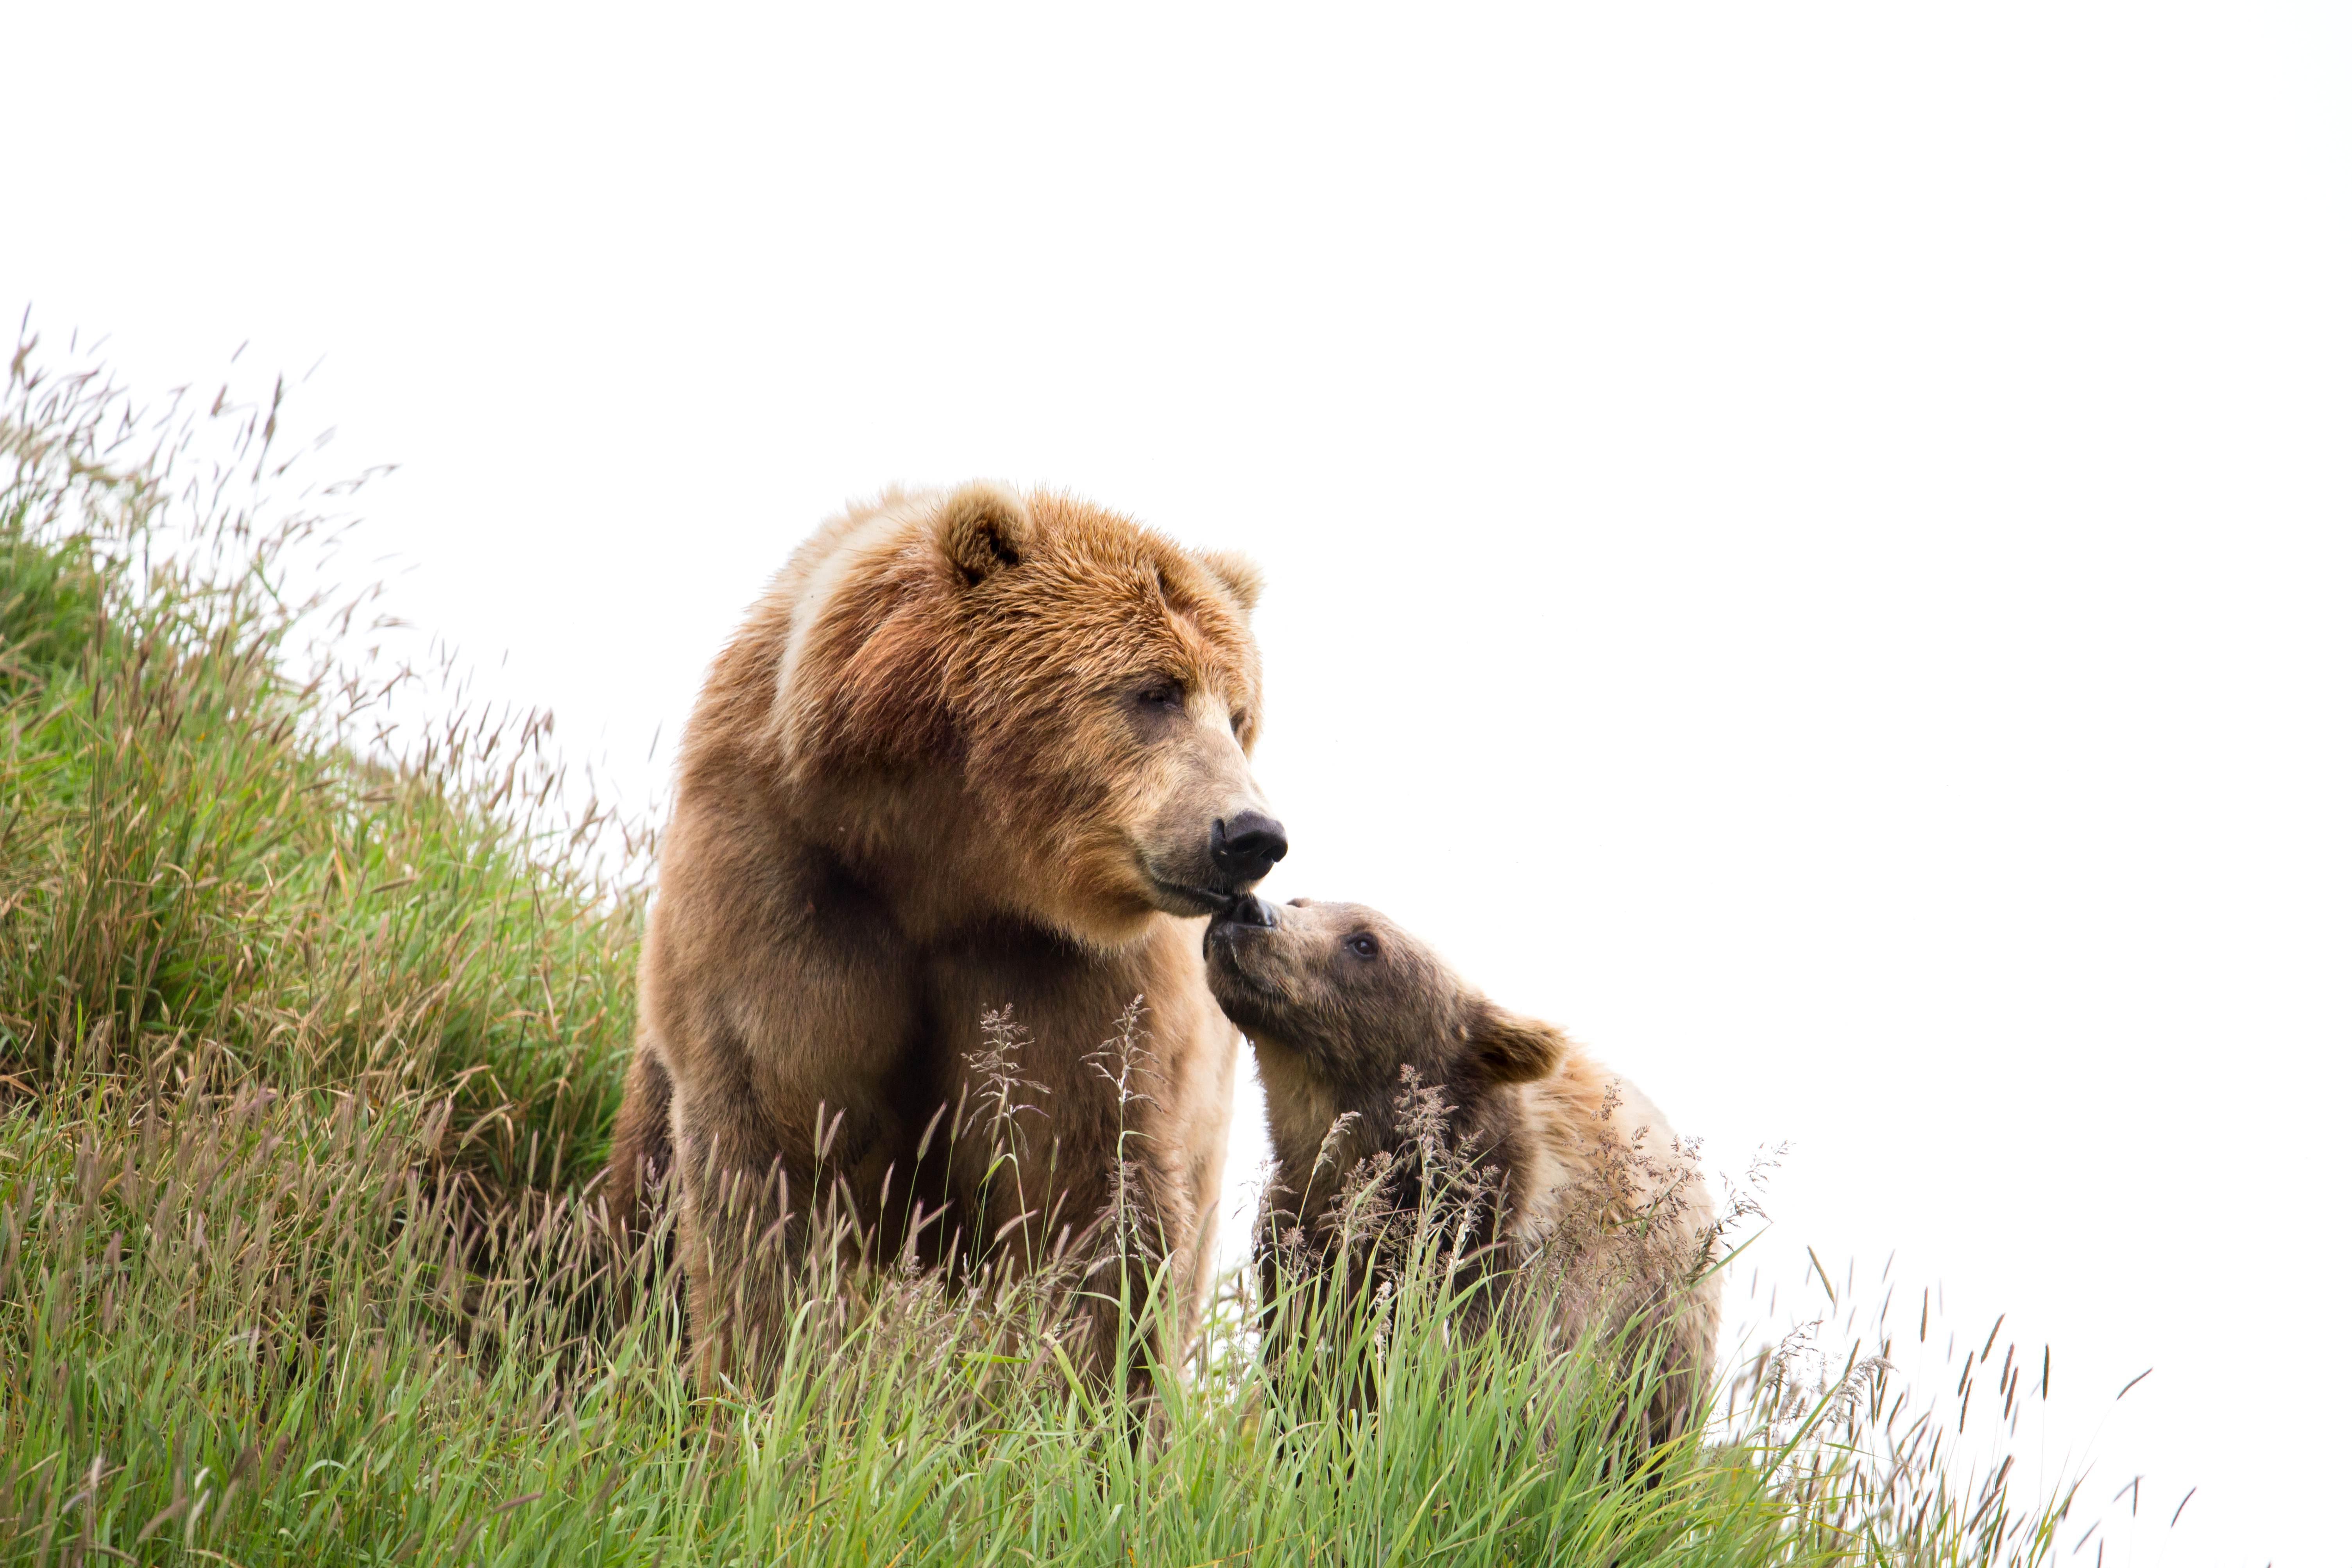 Free picture: kodiak, brown bear, sow, cub